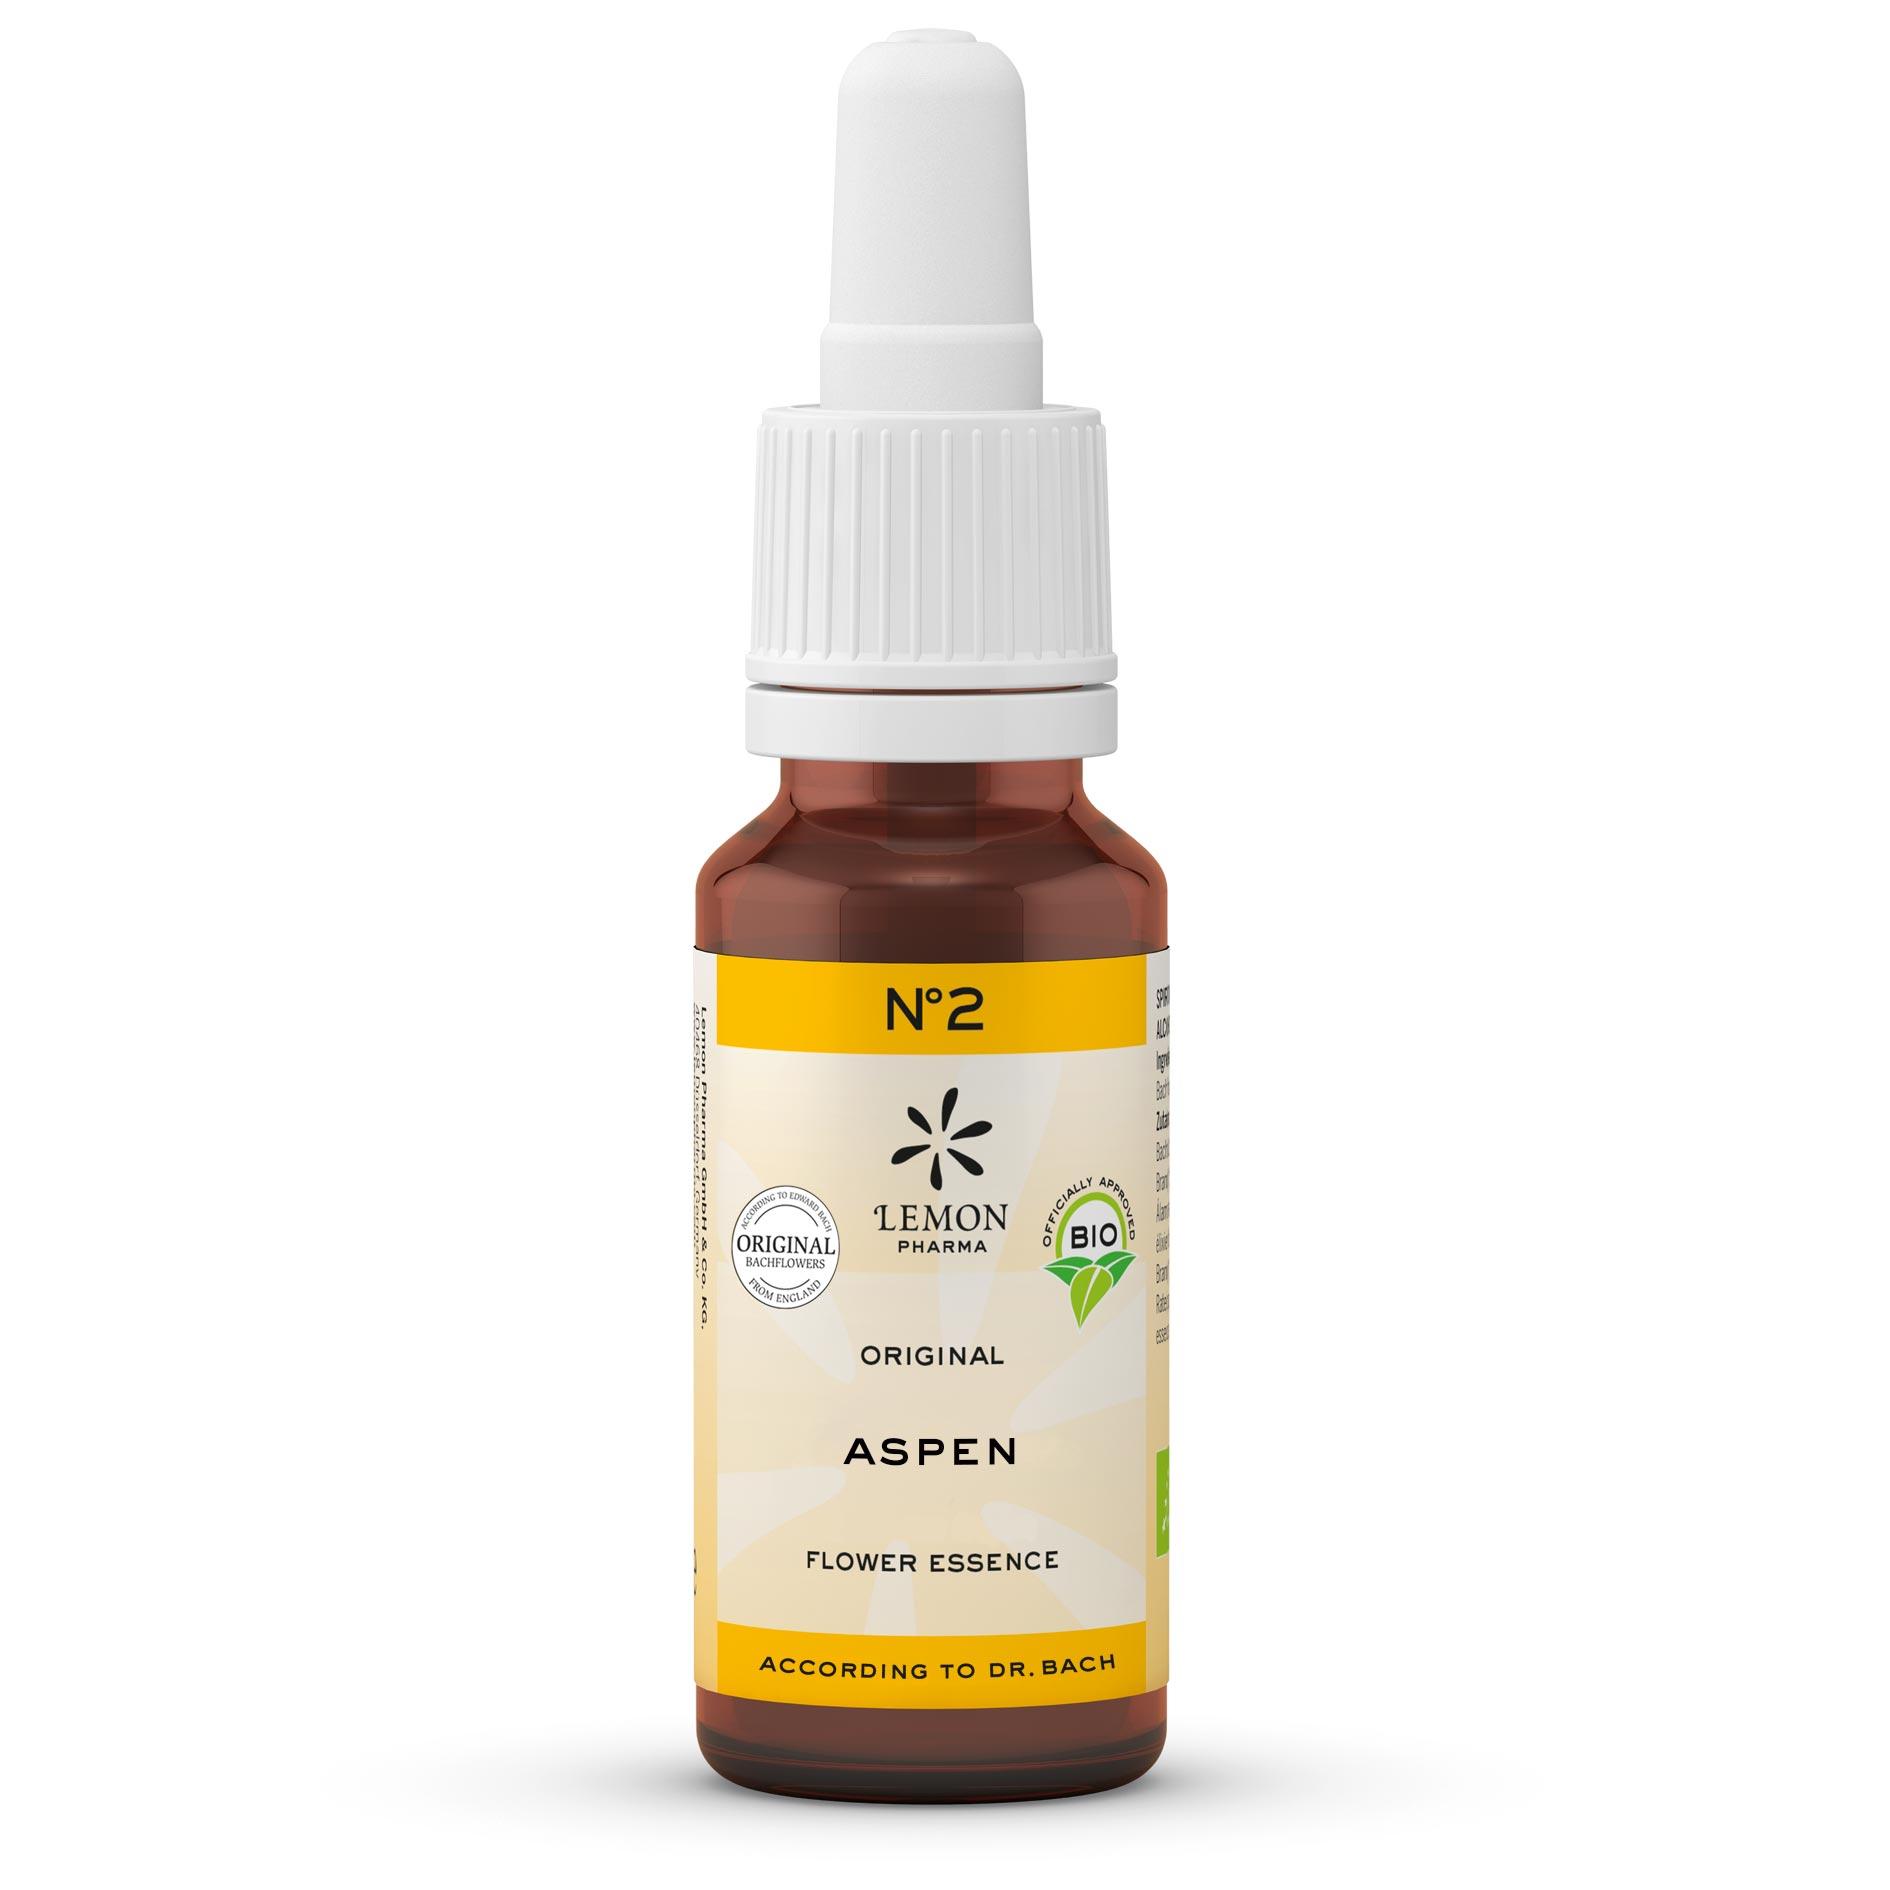 Lemon Pharma Original Bachblüten Tropfen Nr 2 Aspen Zitterpappel Lebensmutes